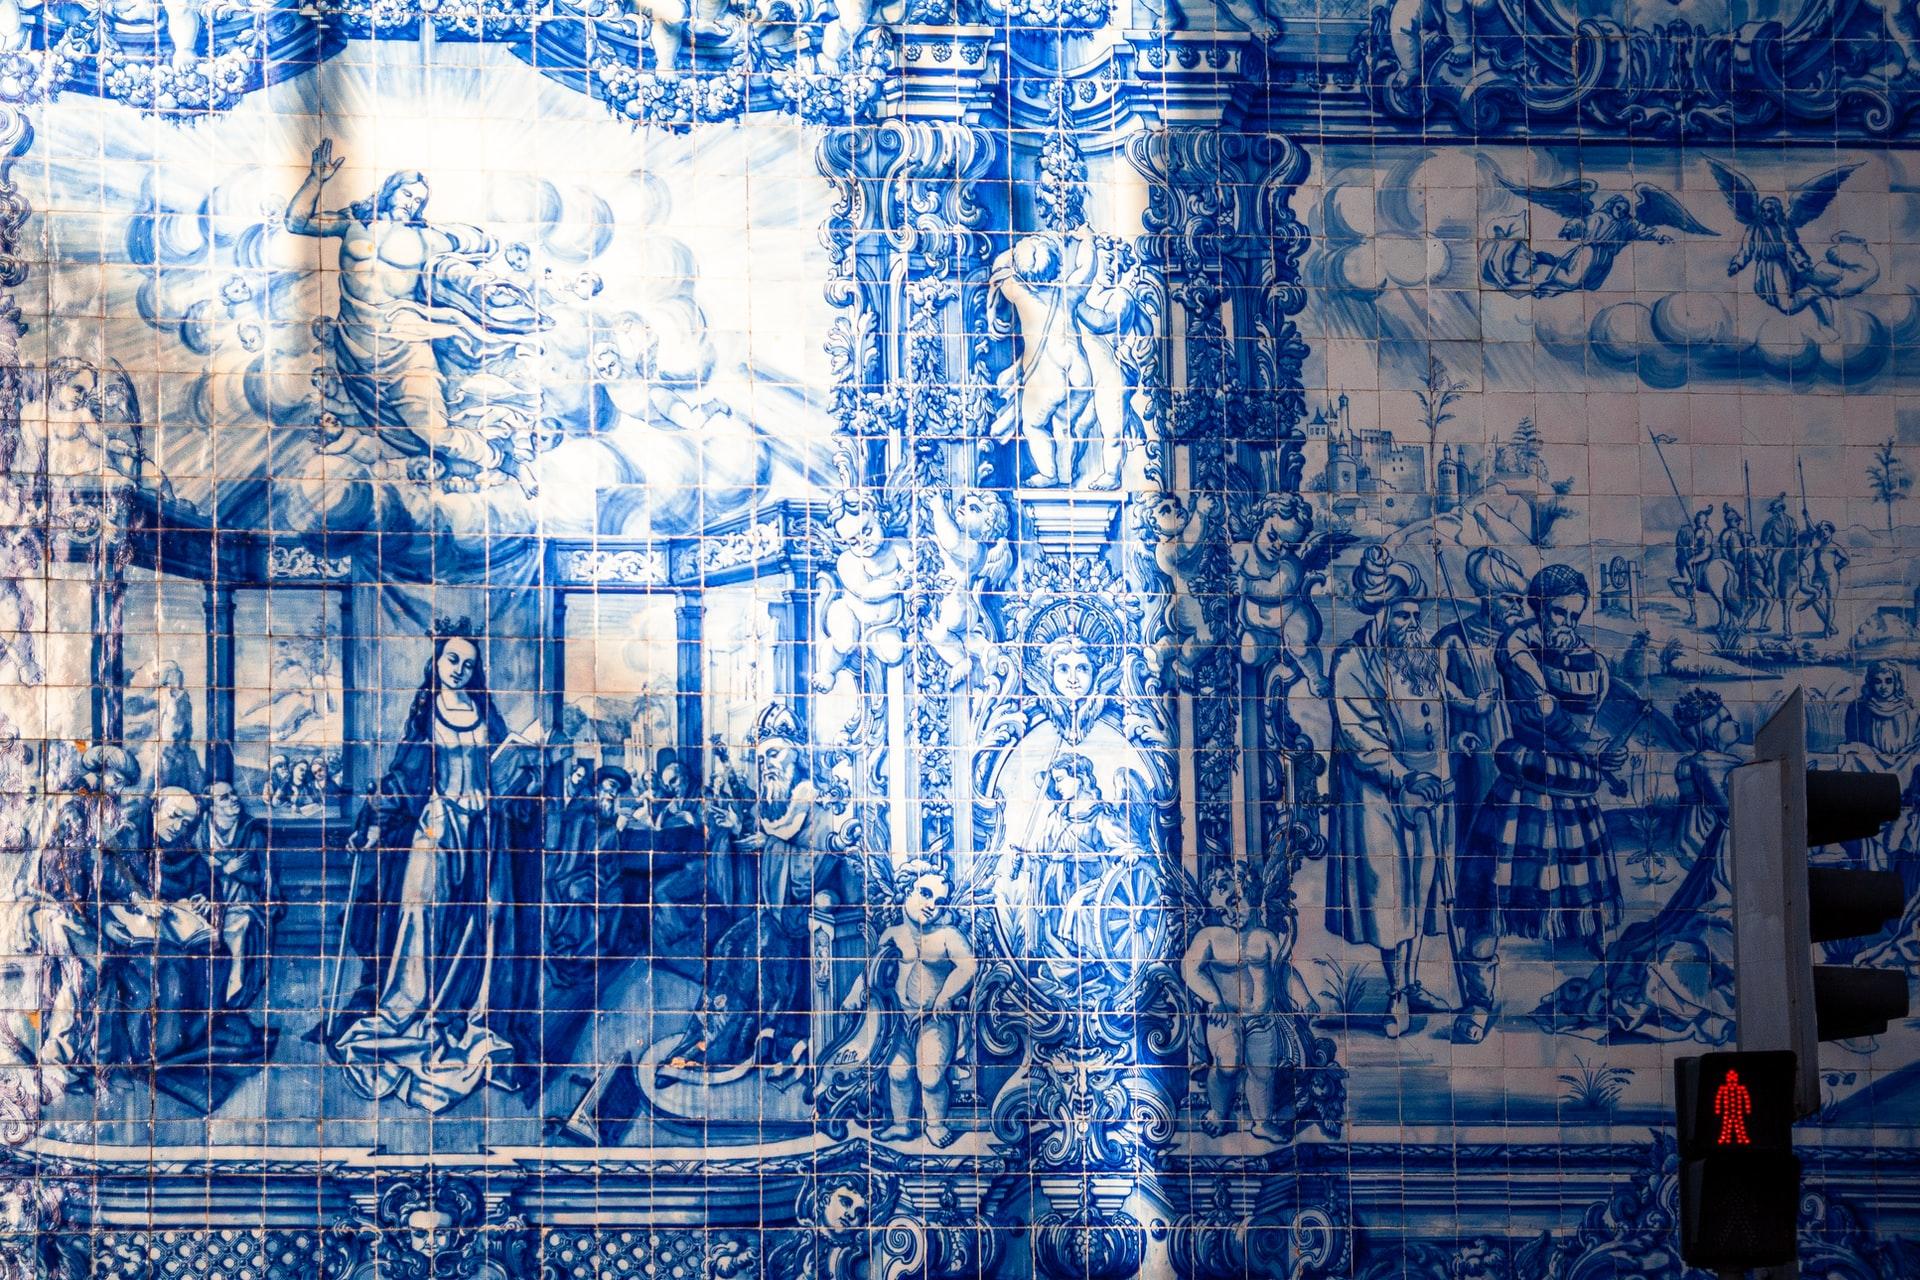 azulejos portugal carrelage bleu typique patrimoine